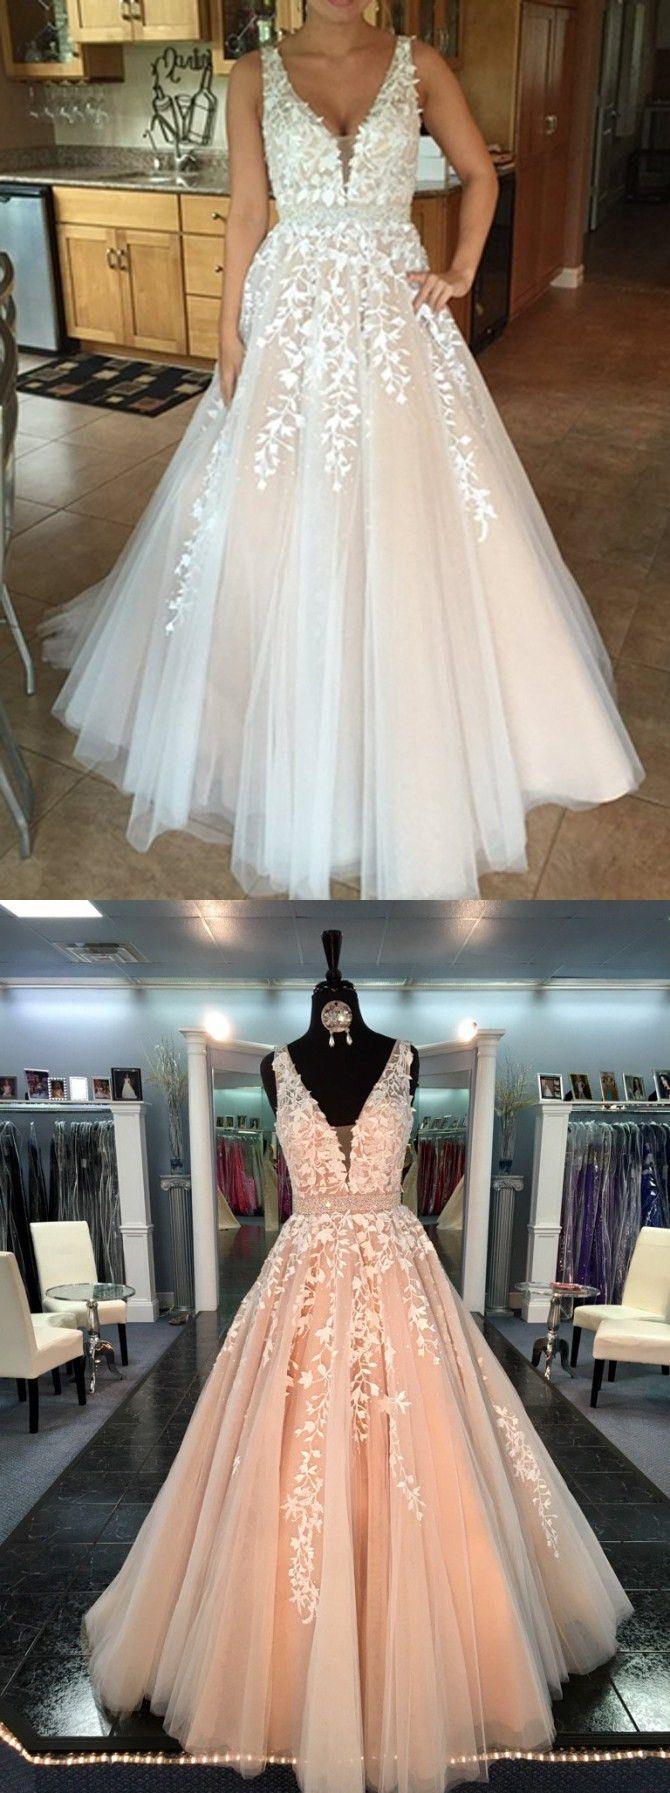 prom dresses, prom dresses 2017, deep v-neck prom dresses, white evening dresses, coral party dresses, vestidos